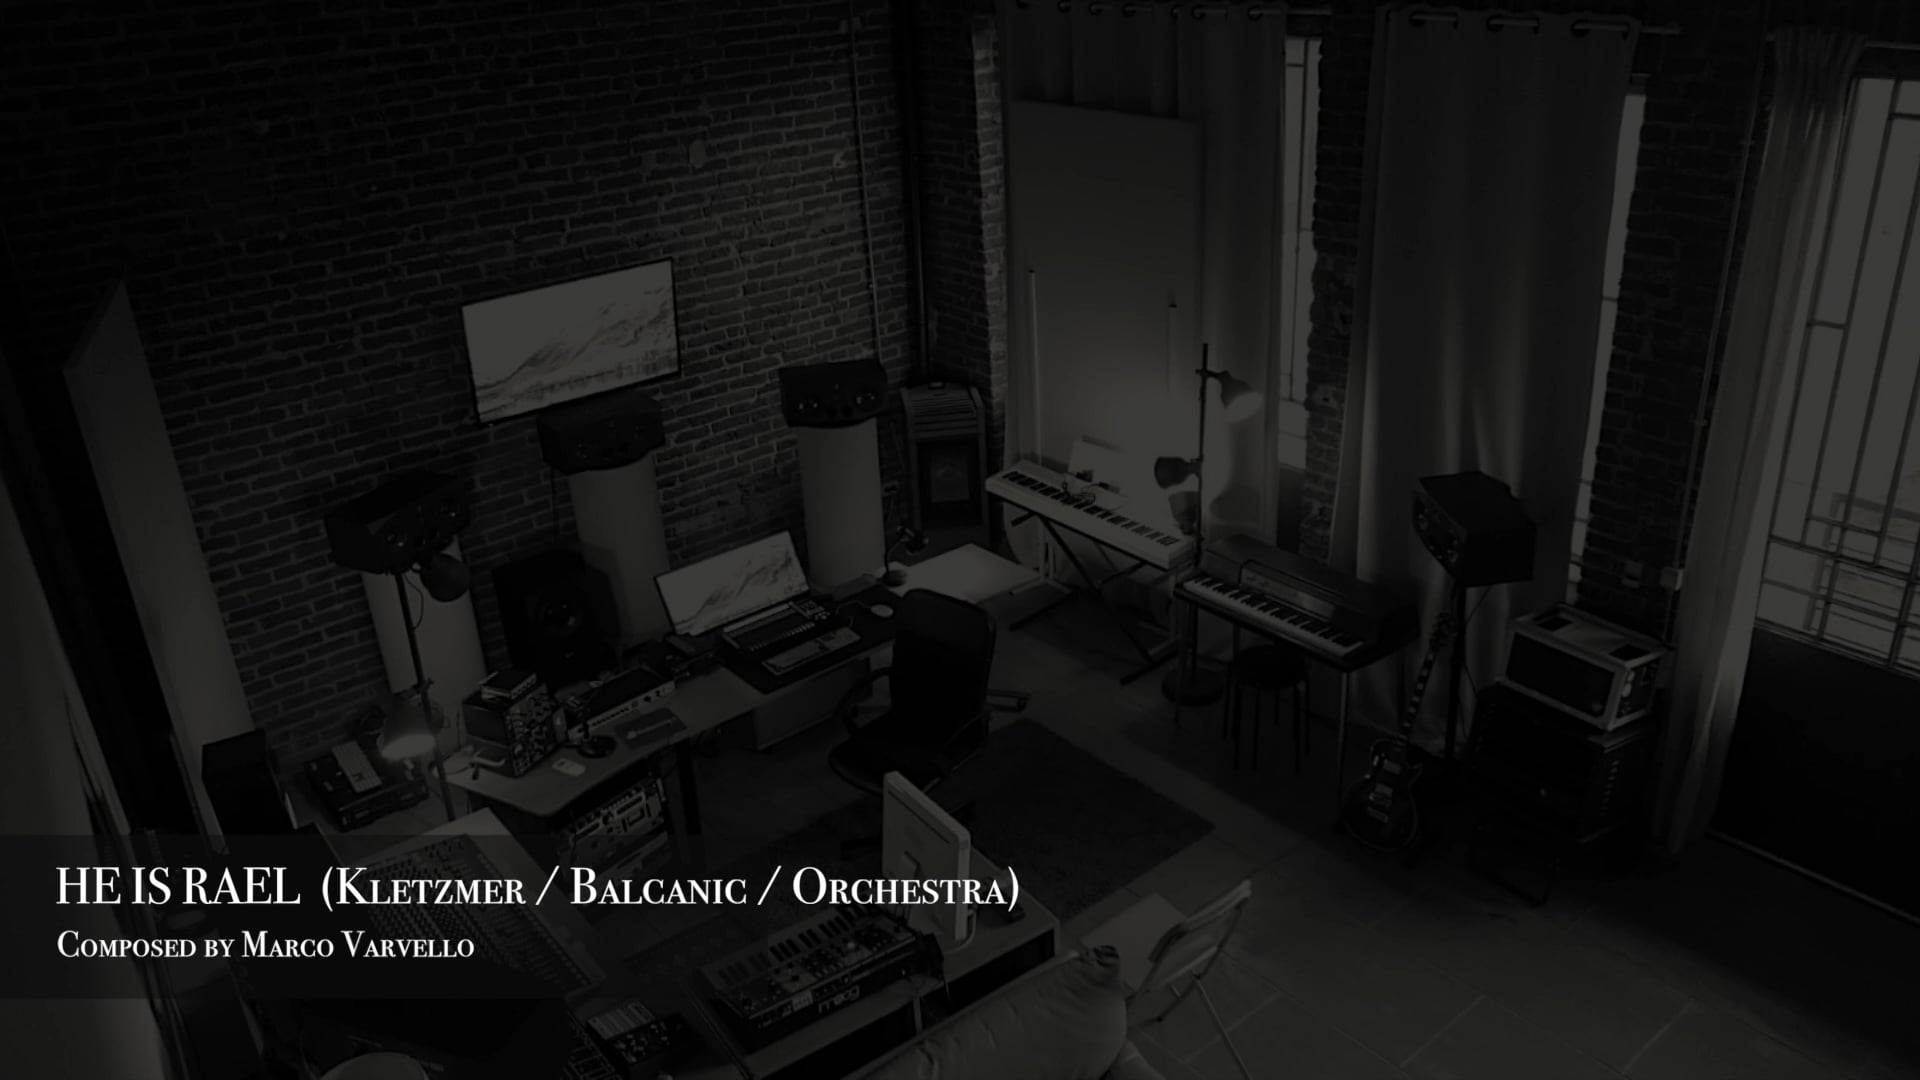 HE IS RAEL (Kletzmer   Balcanic   Orchestral) SOUNDTRACK MUSIC